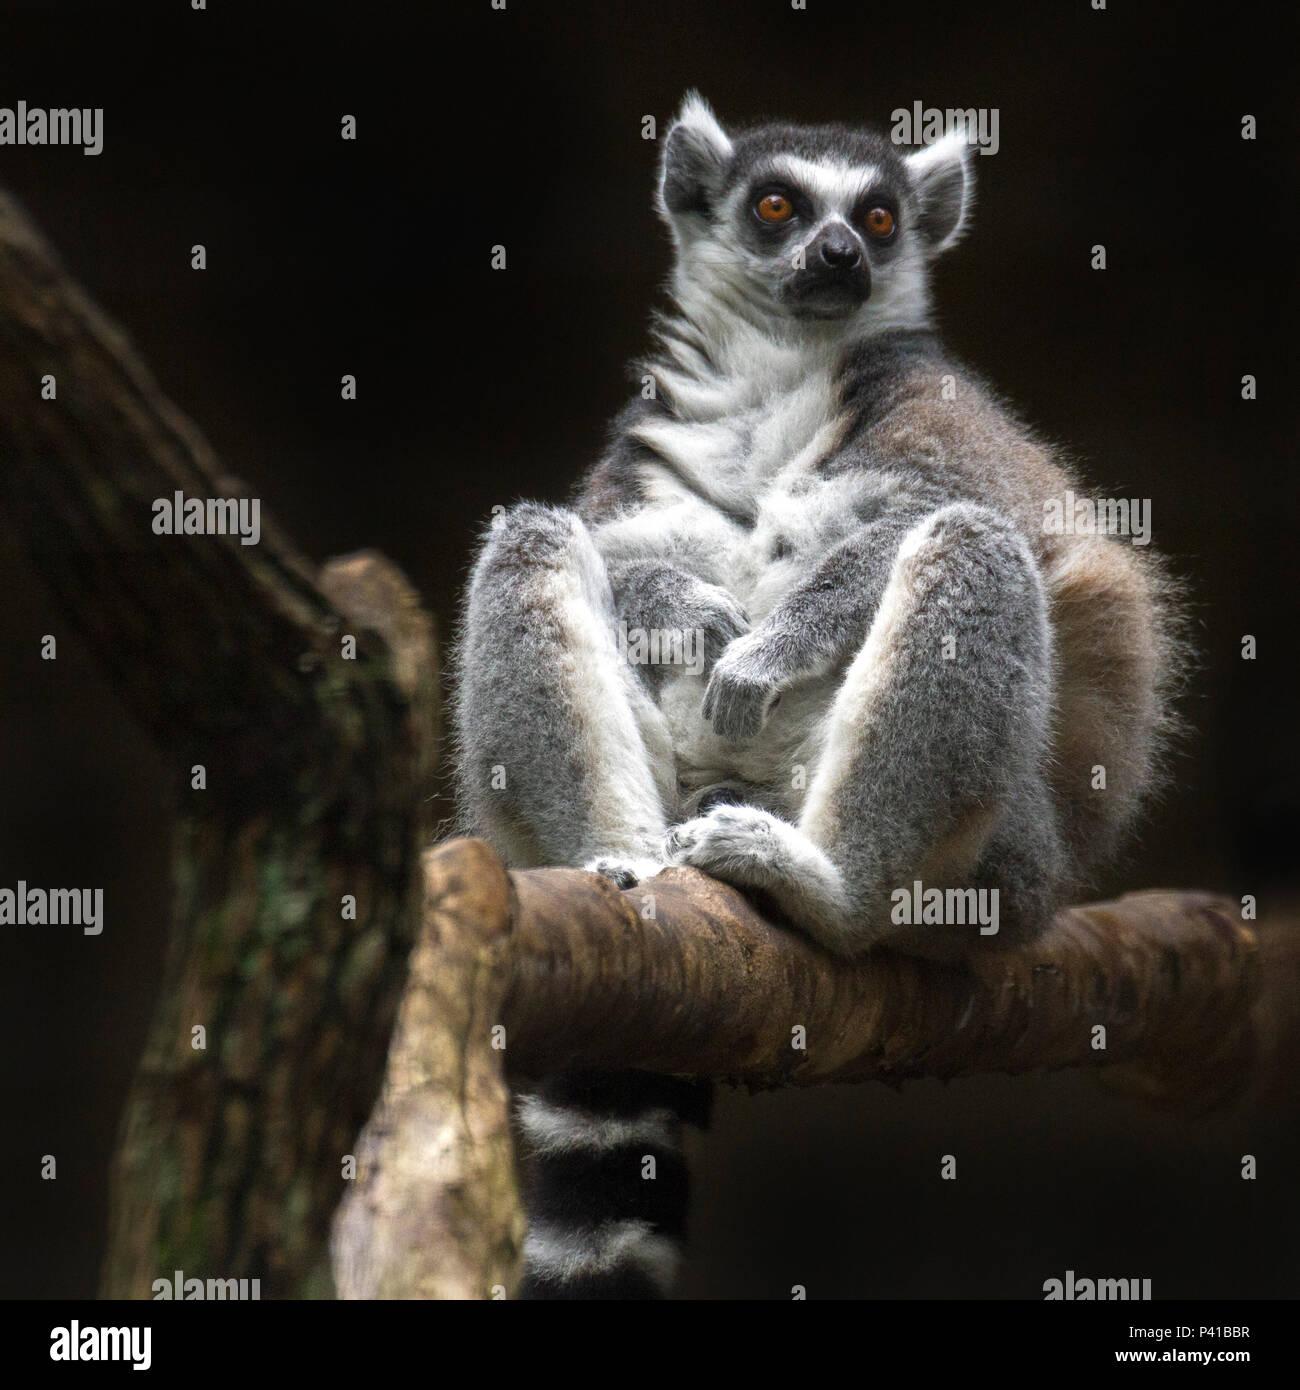 Lémure-de-cauda-anelada; Lemur catta; primata estrepsirrino.Mamífero; animal; Fauna; Natureza Stock Photo